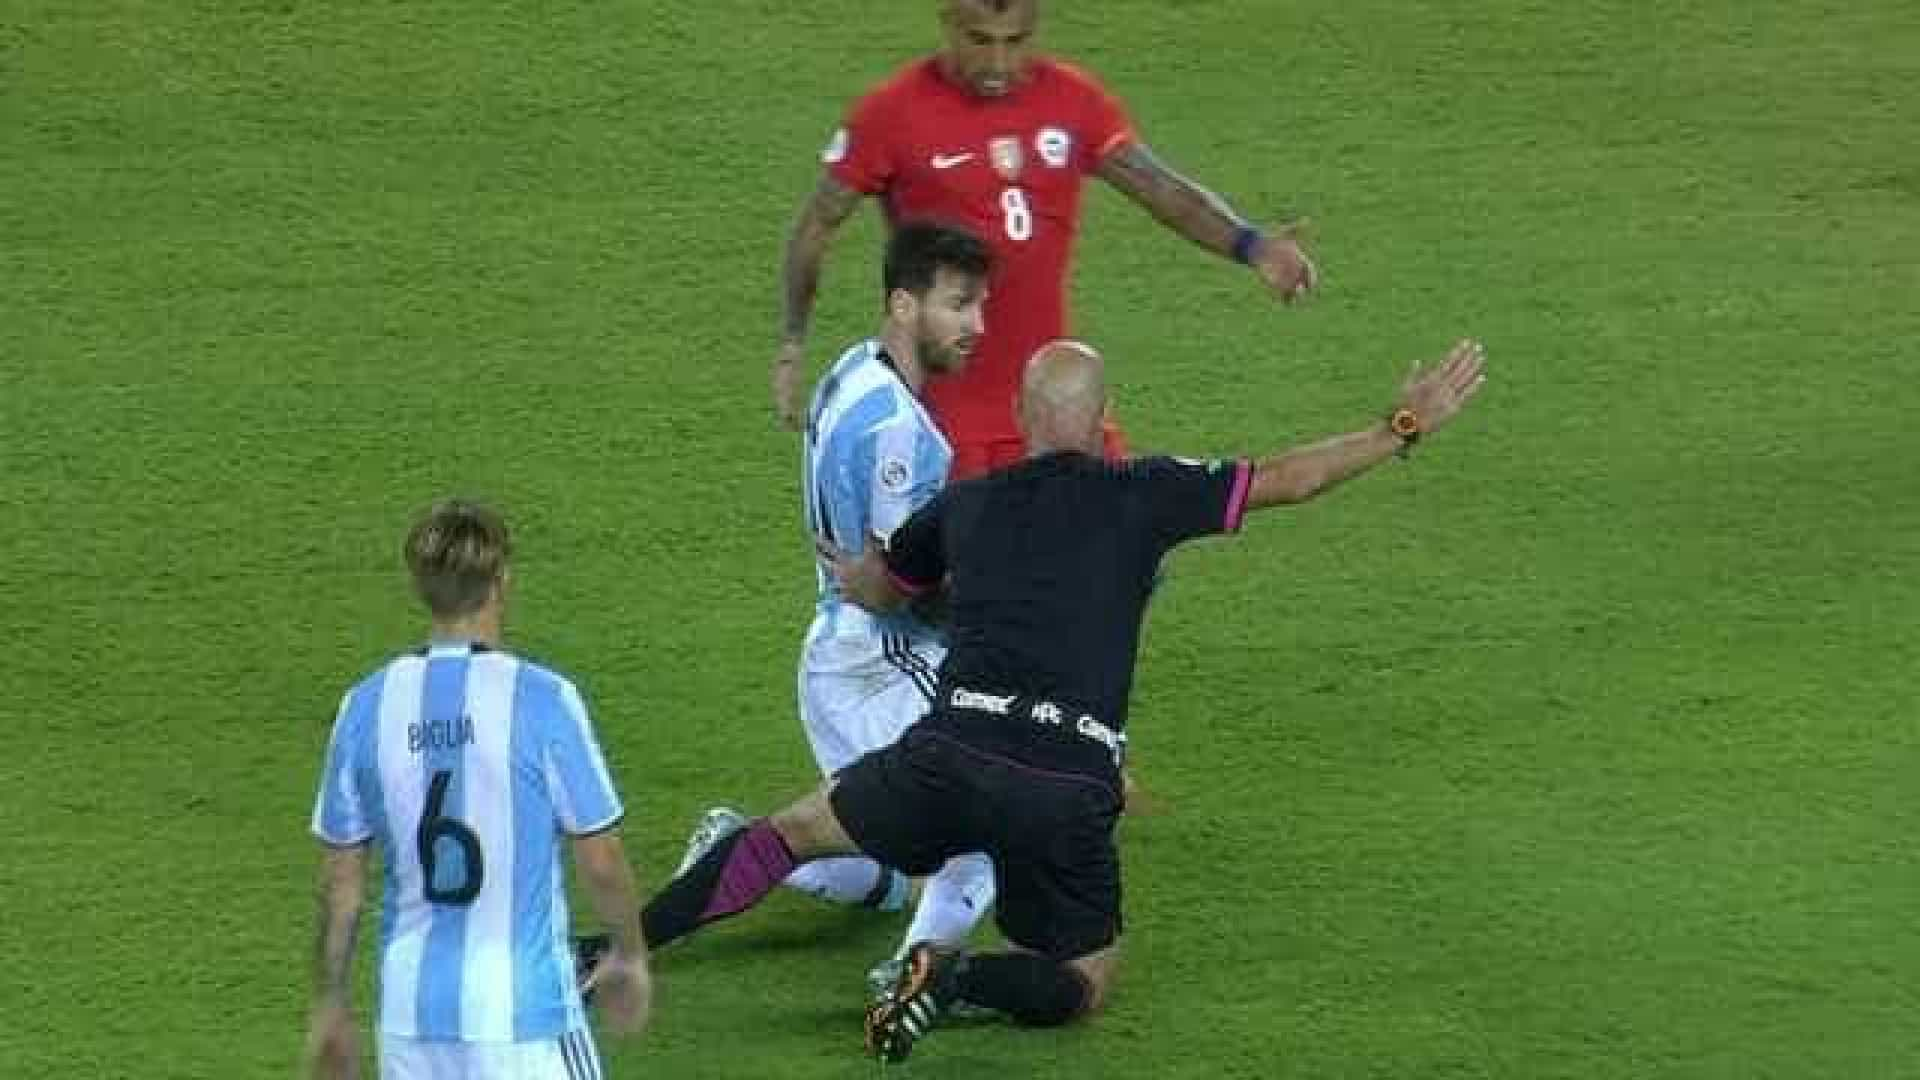 Chamado de 'cagón', juiz brasileiro protagonizou lance bizarro com Messi